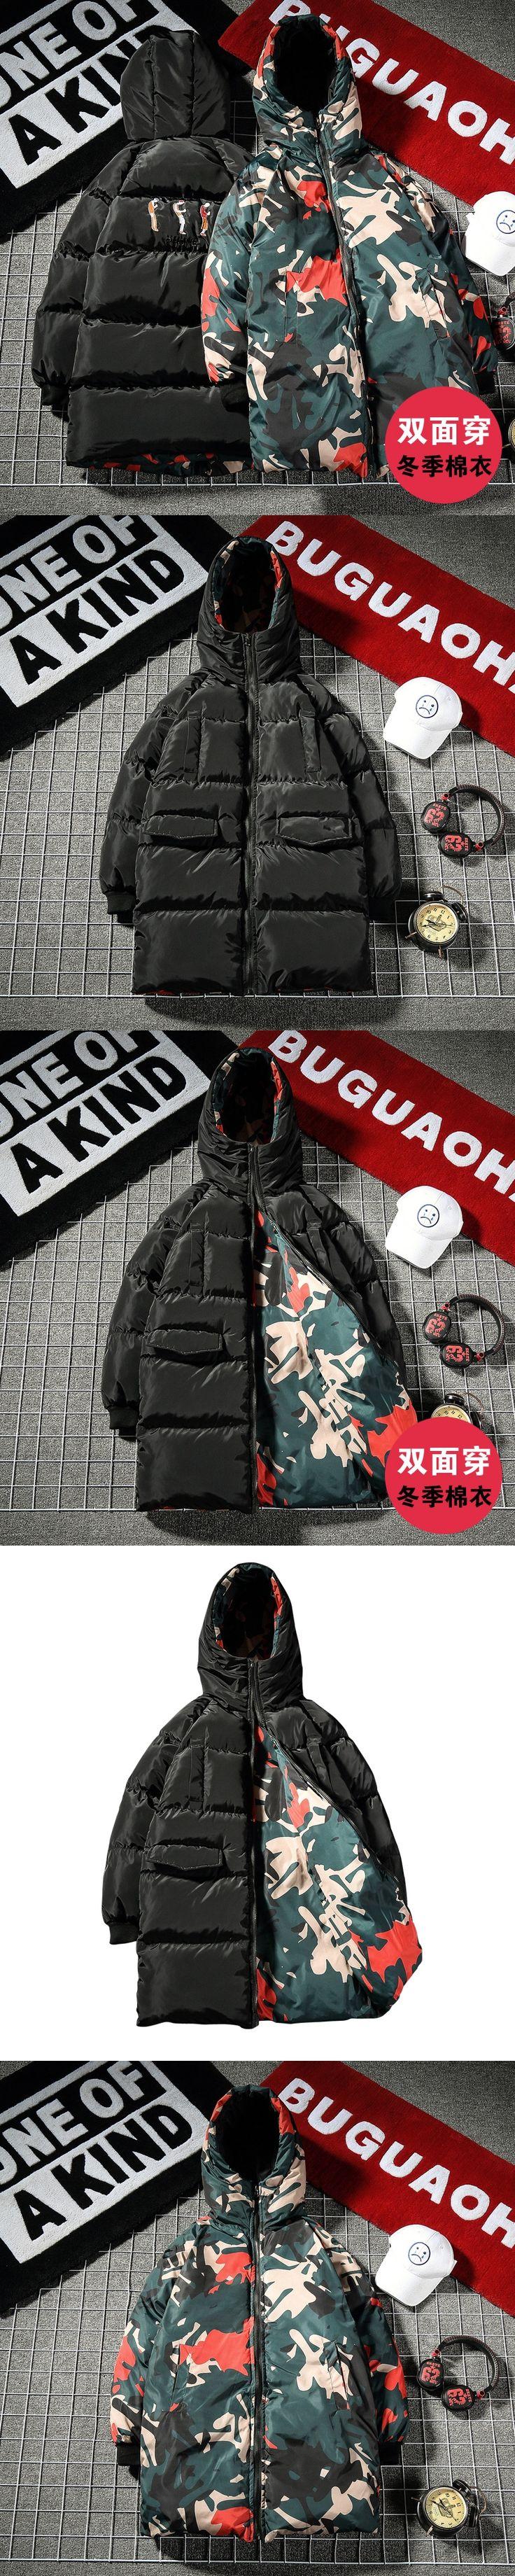 Chaqueta Hombre Invierno 2017 Flower Reversible Mid-long Padded Jacket  Black Green Camo Designer Winter Men Puffer Parka Homme